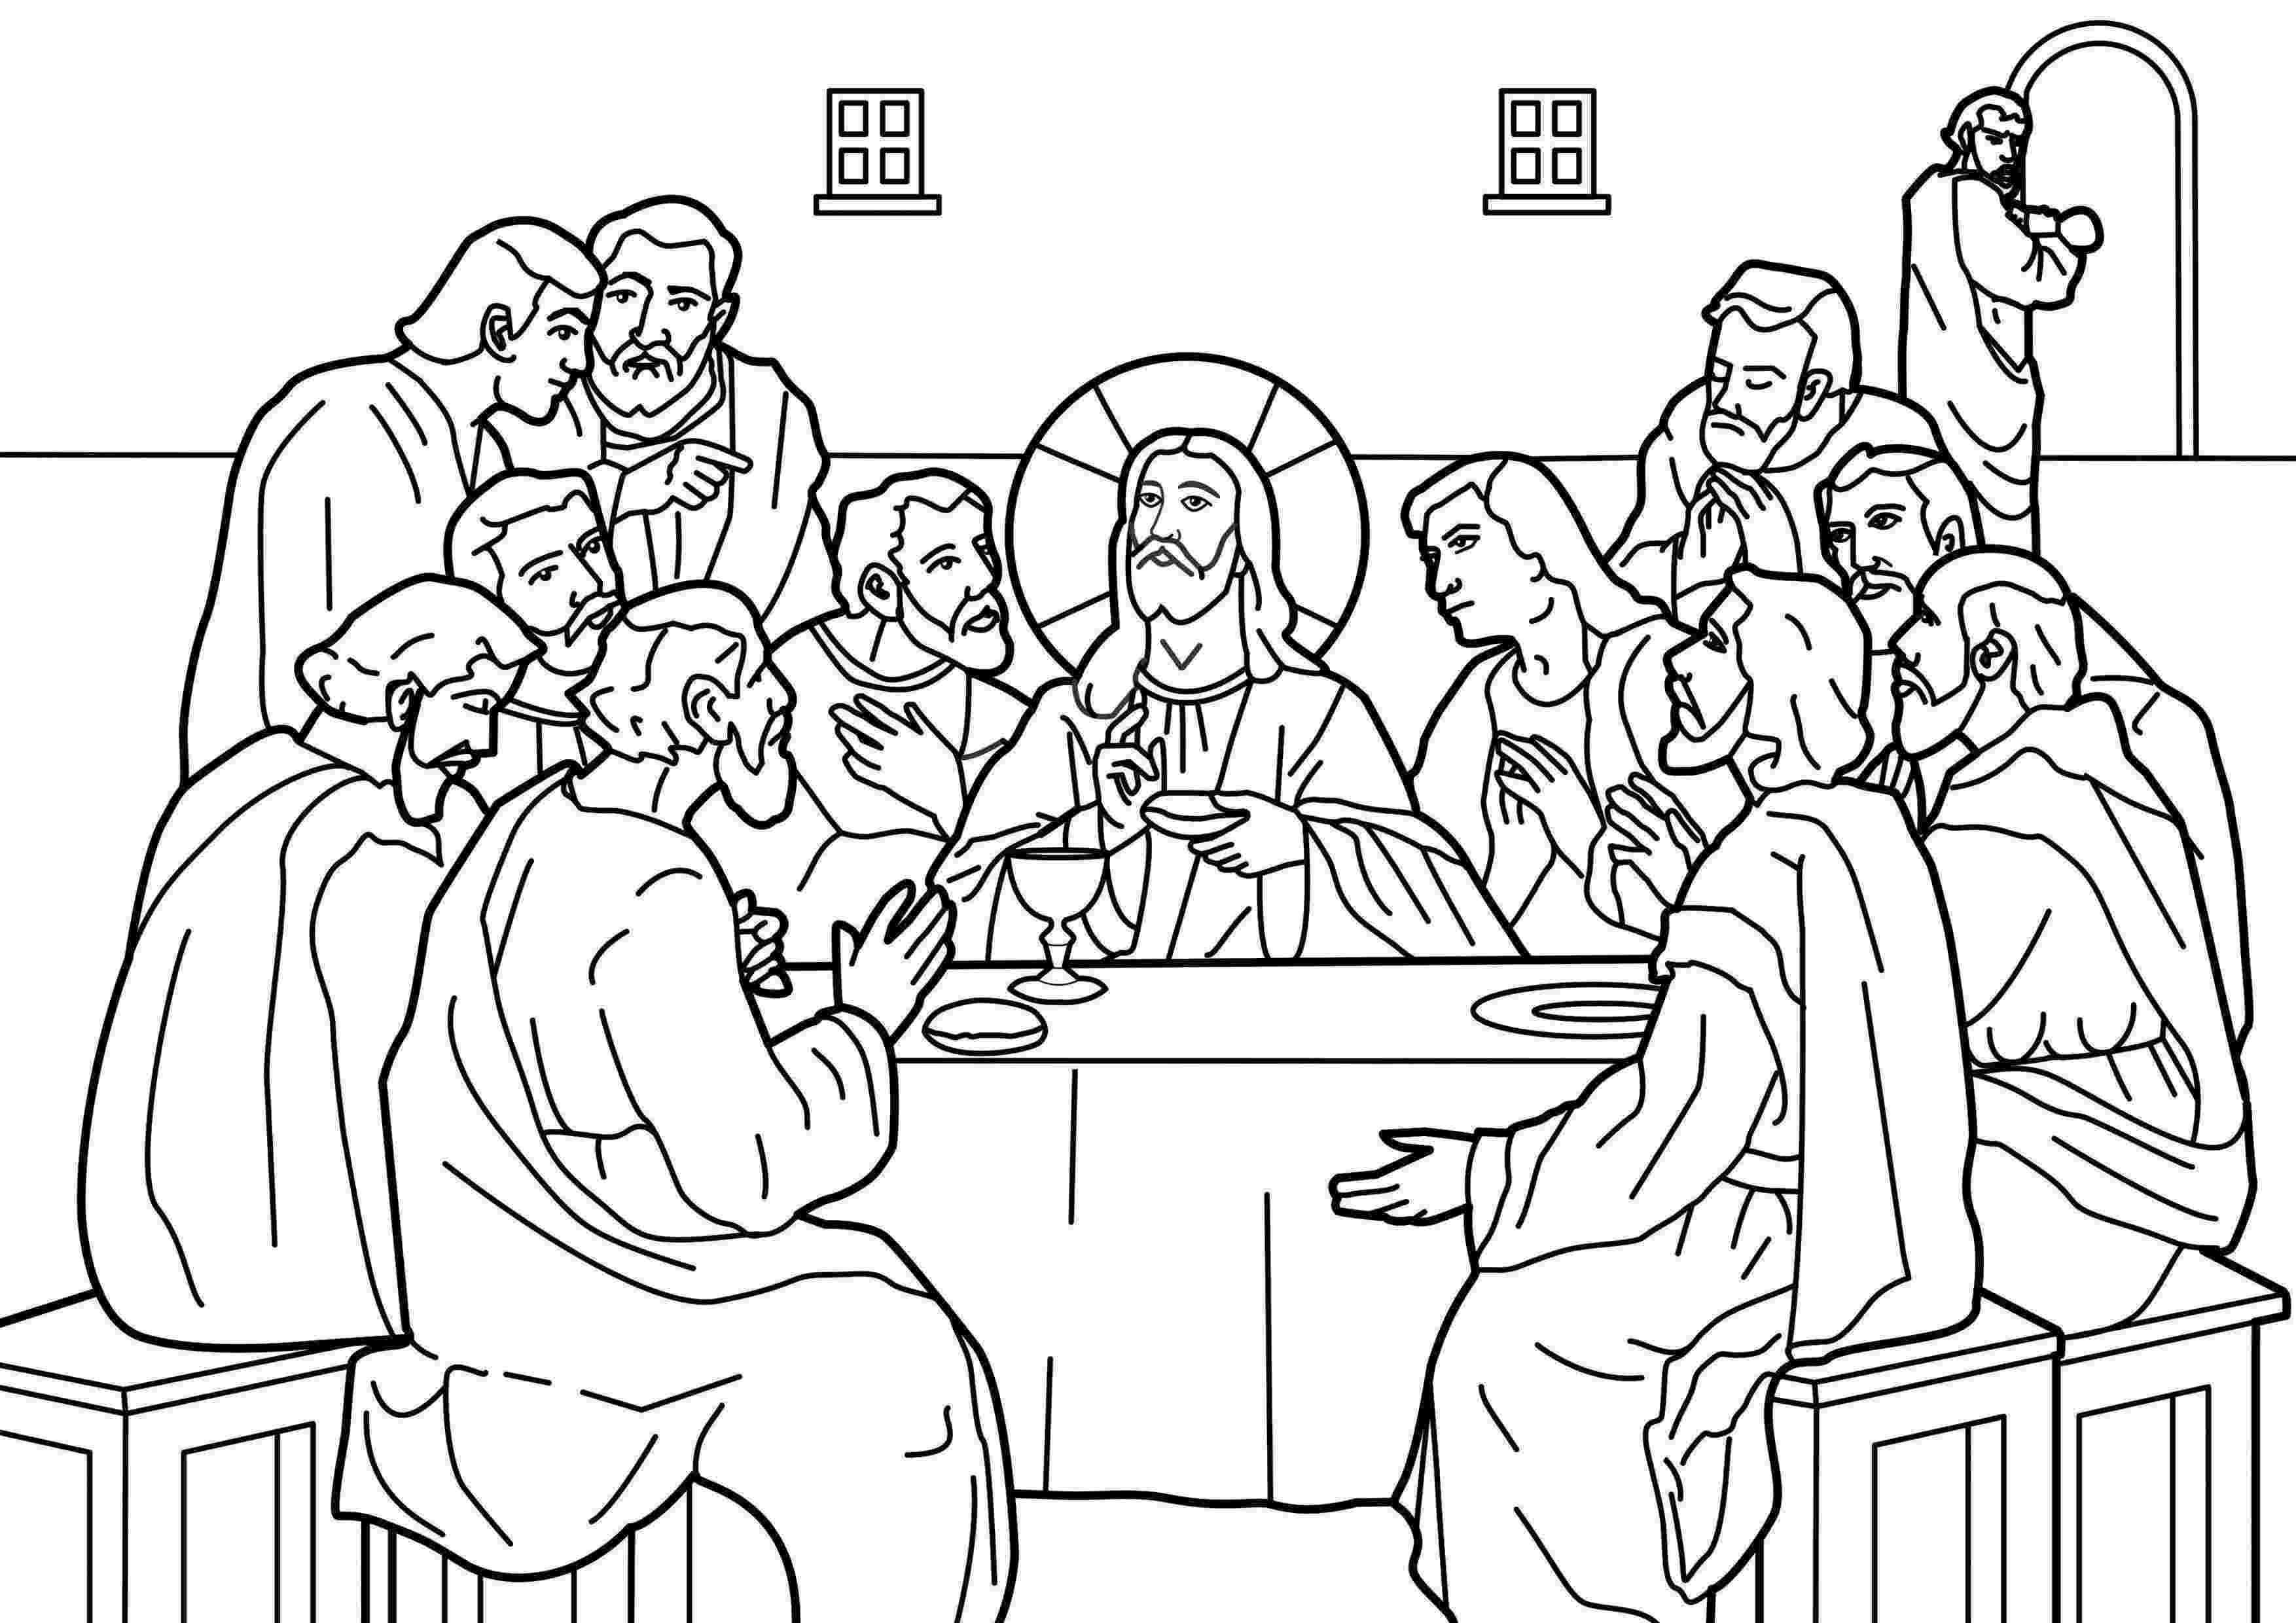 jesus last supper coloring page jesus christ coloring printable page for the last supper coloring last supper page jesus